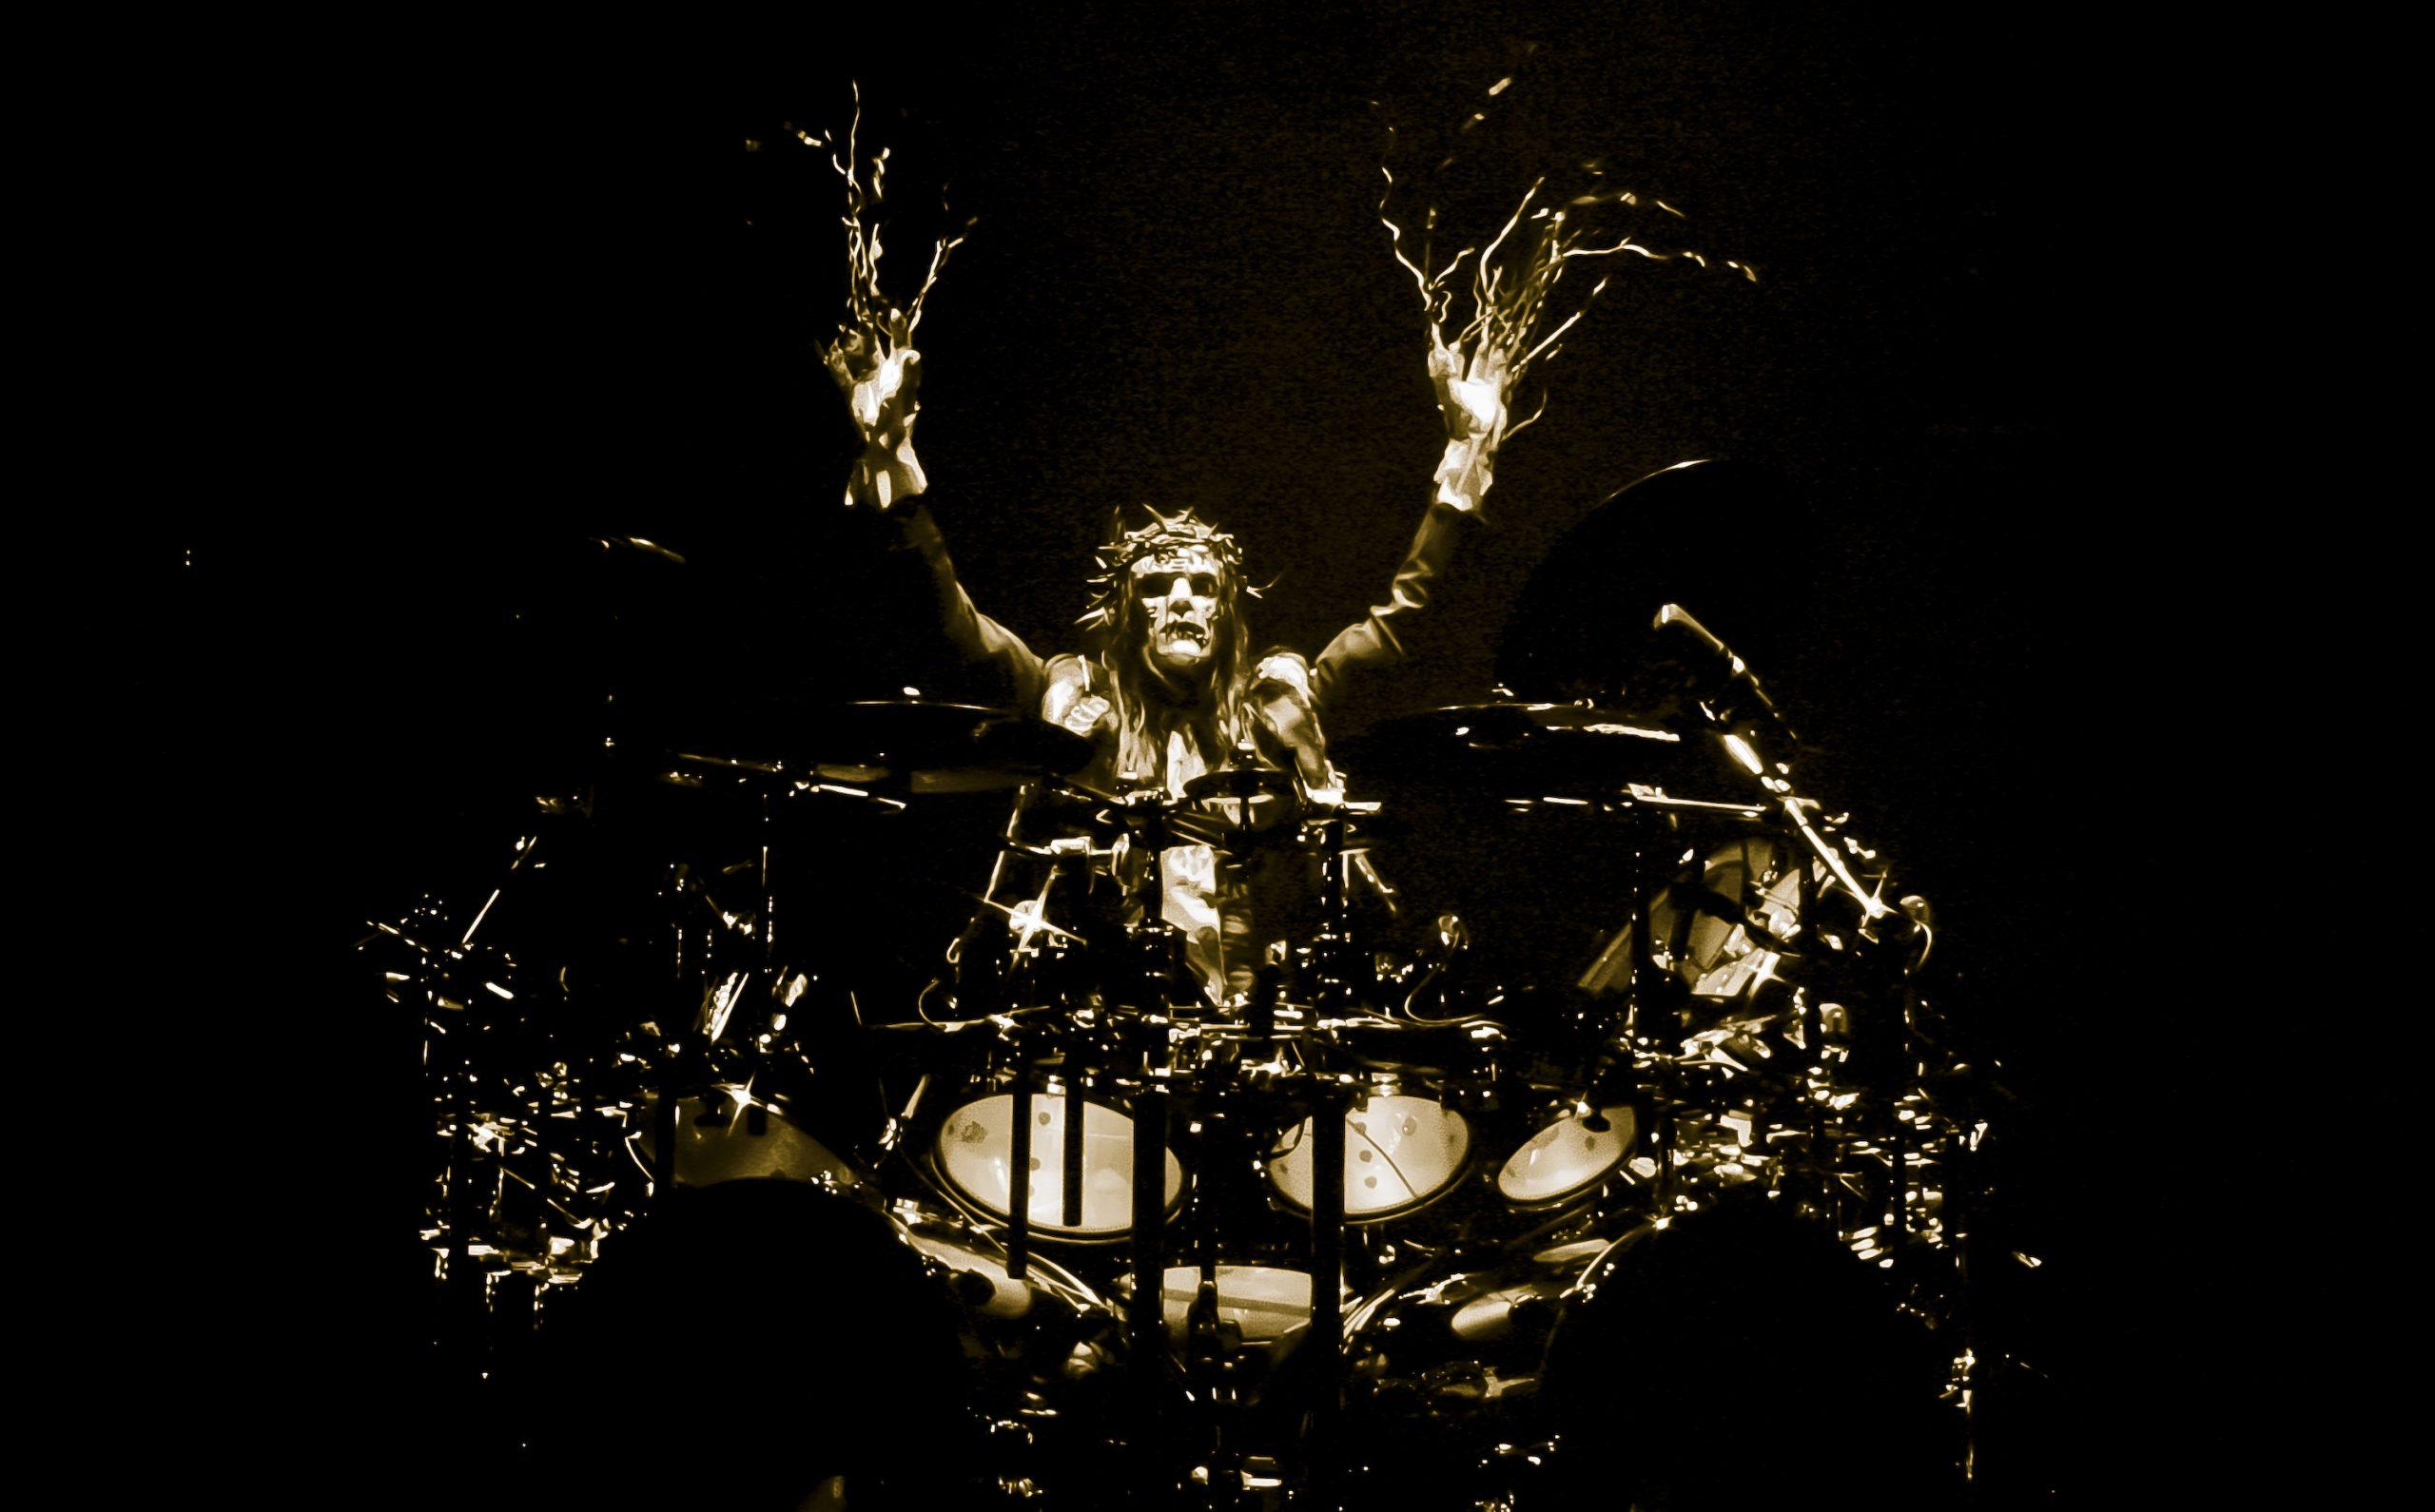 Joey Jordison con Slipknot